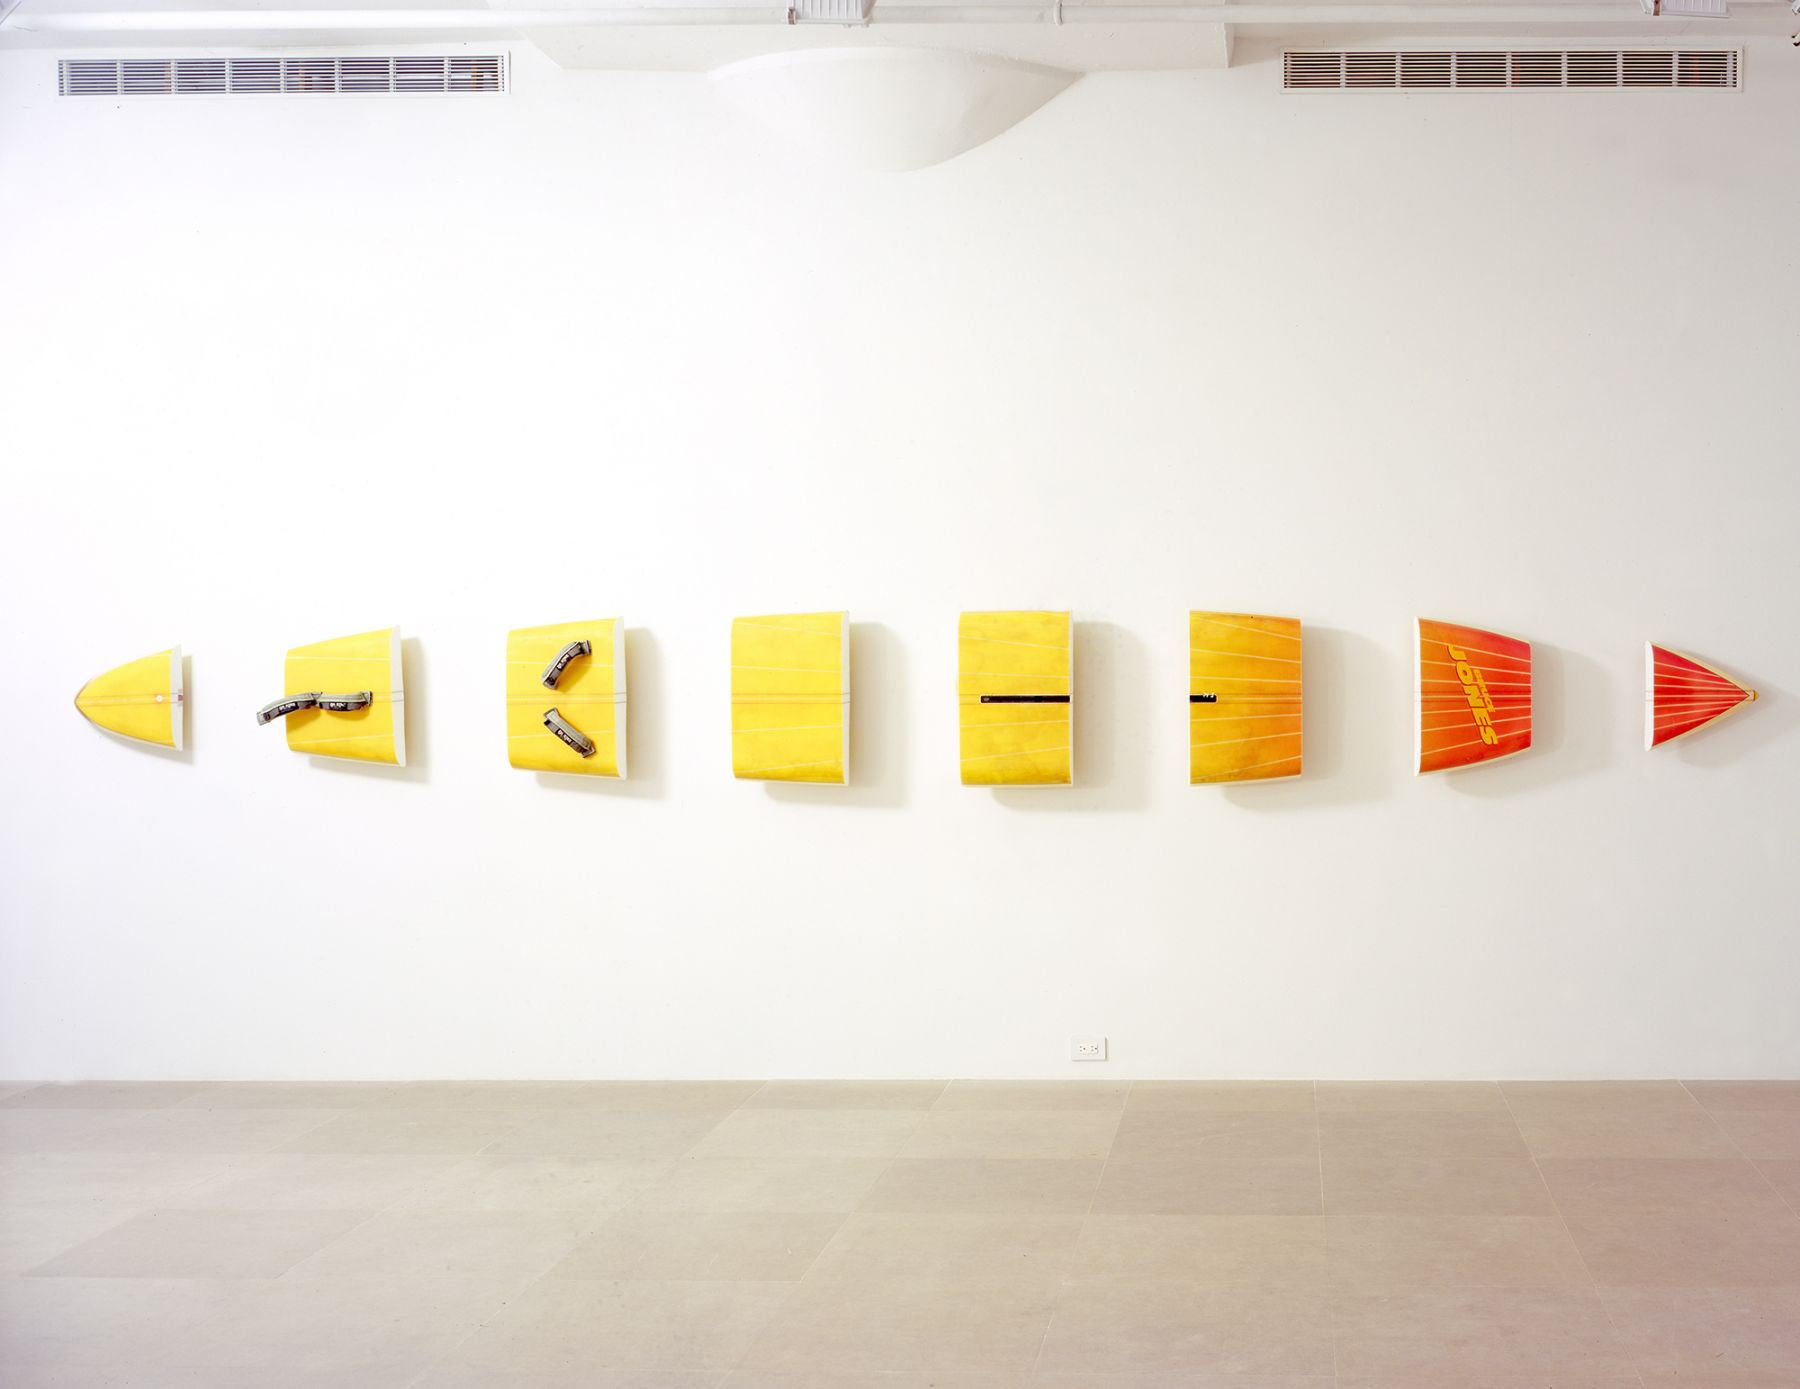 Michael Krebber, Bruce Jones, 2008, Windsurfing board, wall mounts, 23 1/2 x 223 inches